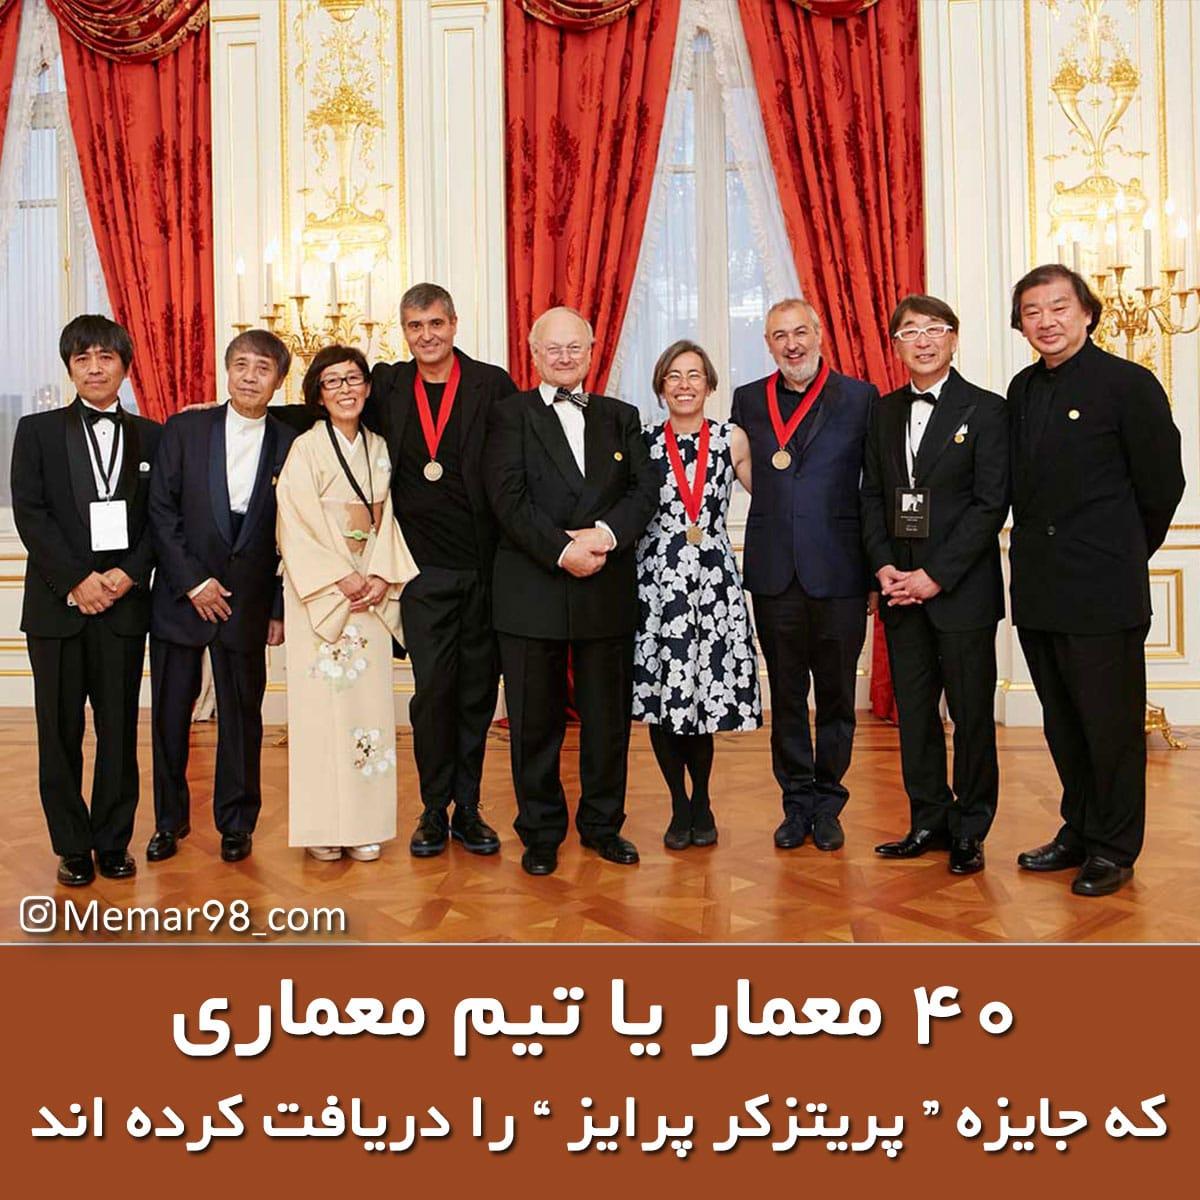 جایزه پریتزکر پرایز